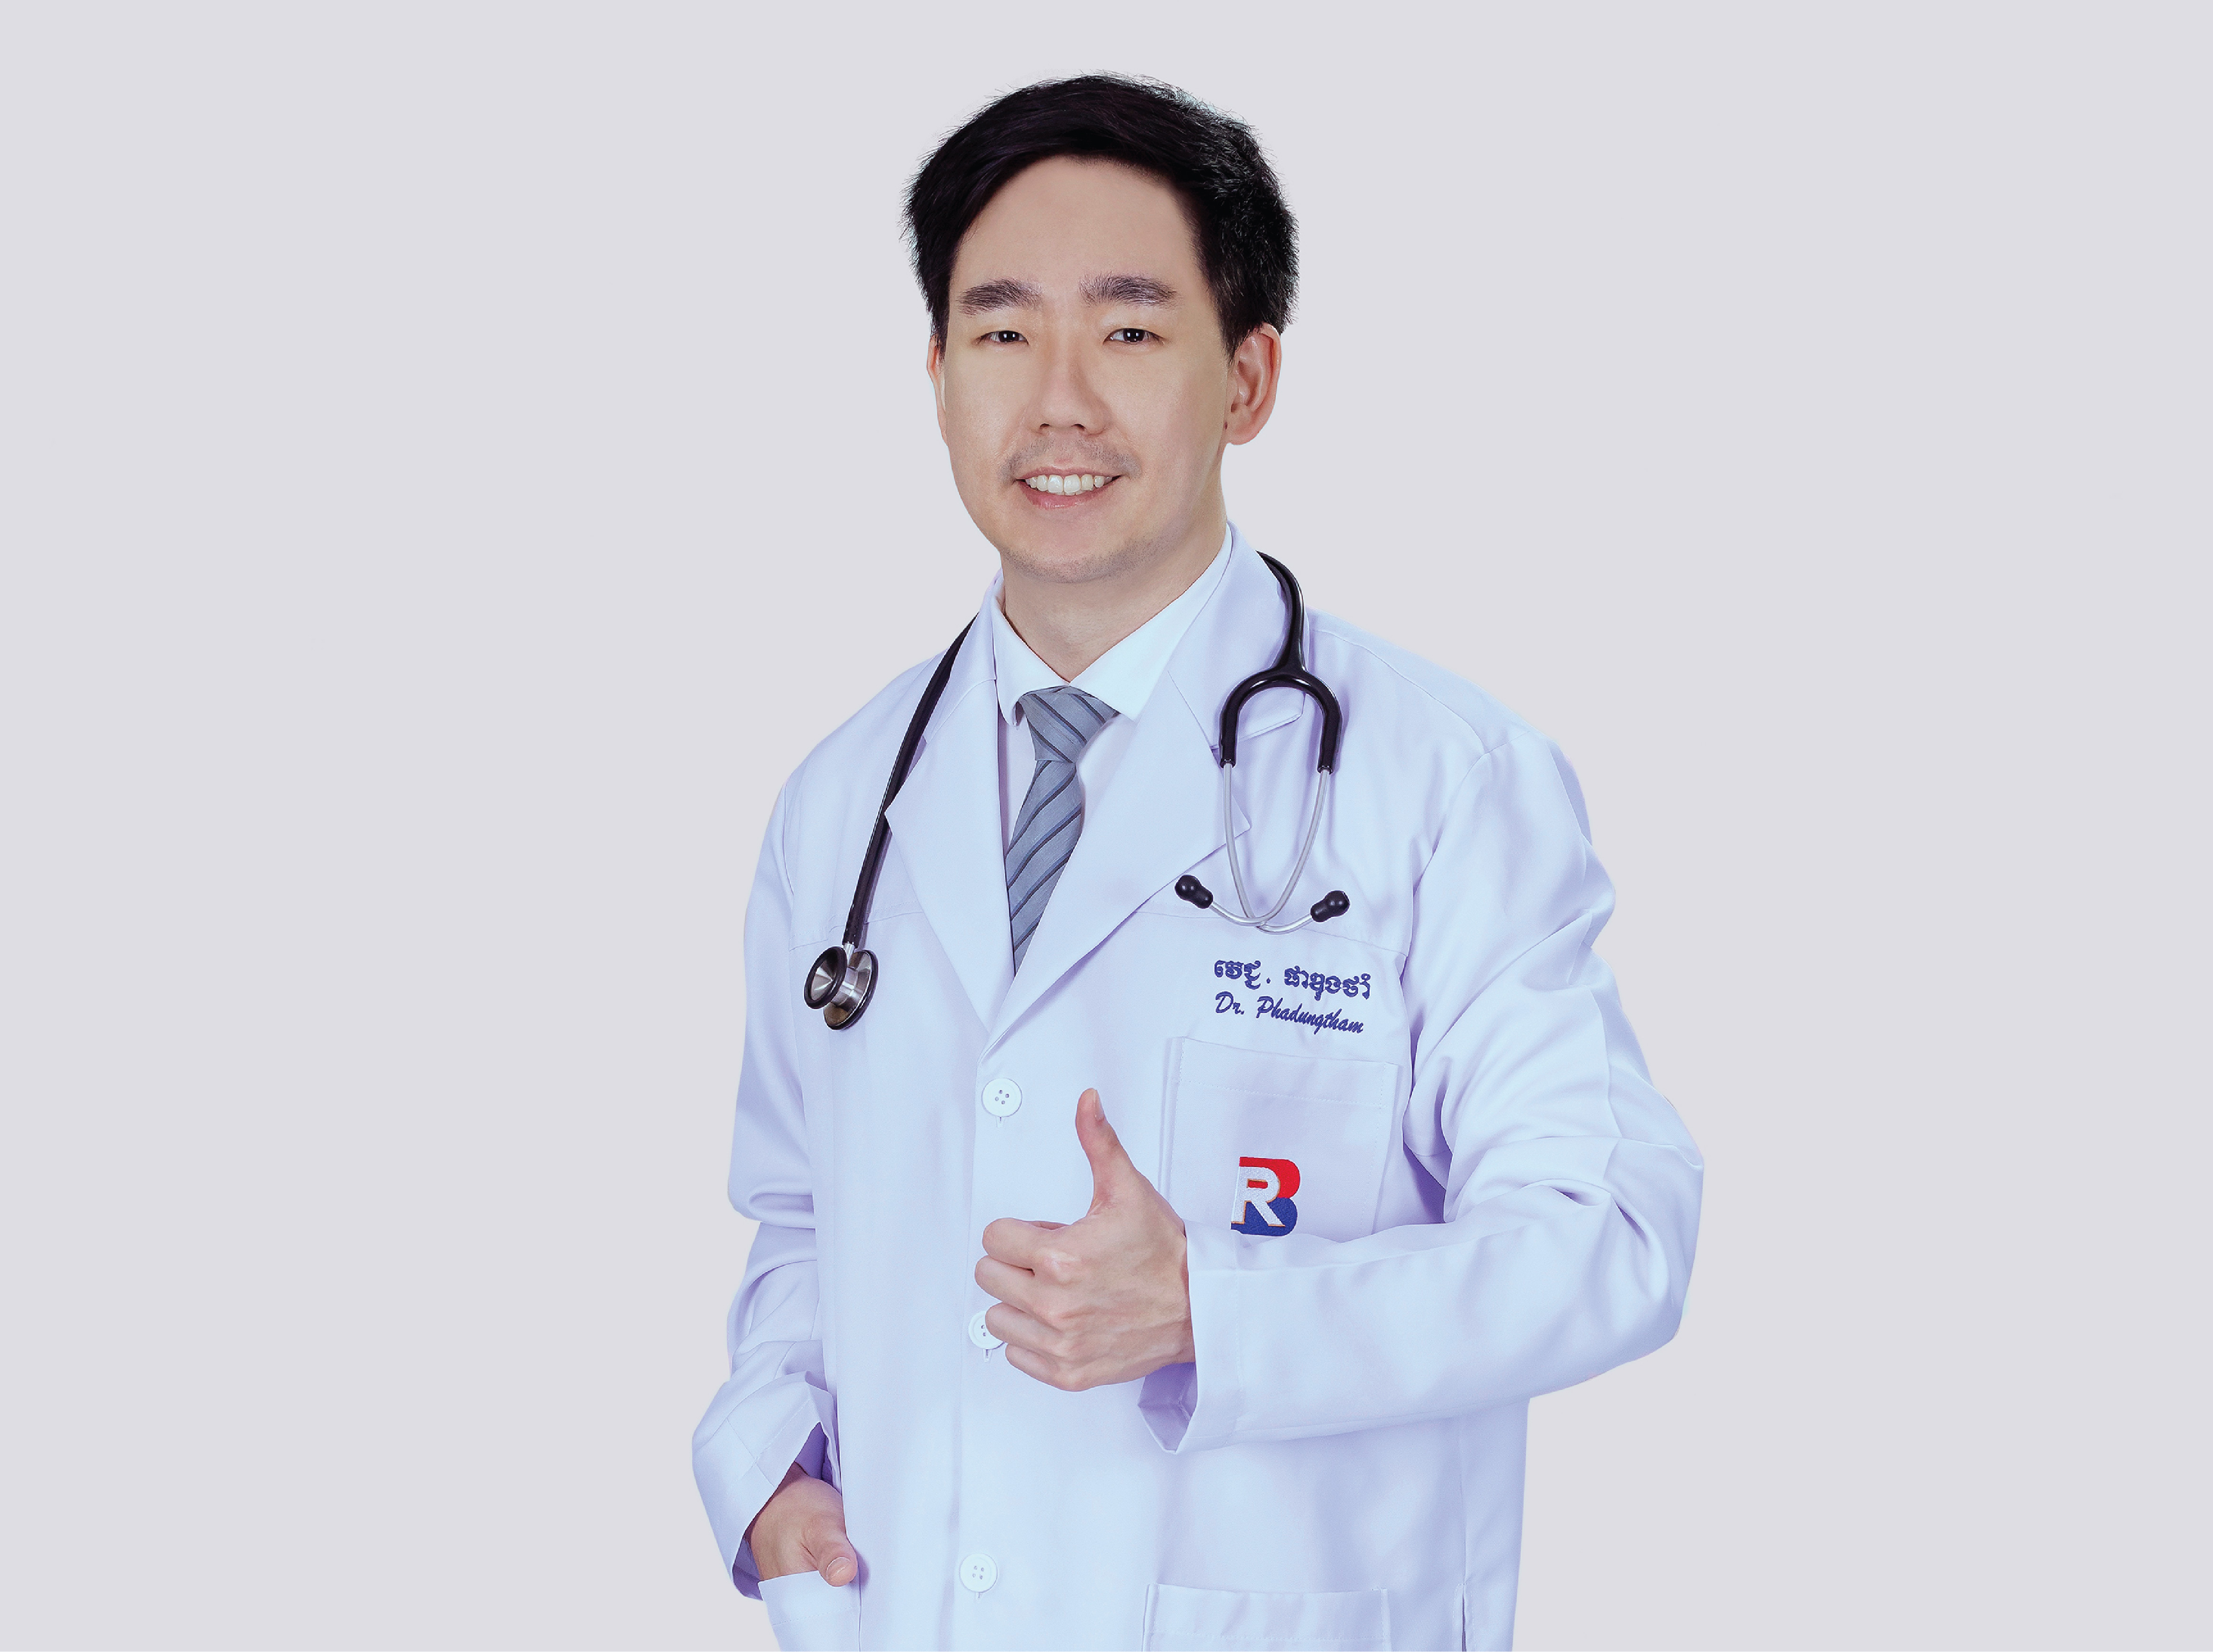 Dr. Phadungtham ThiengburanaThum (TH)